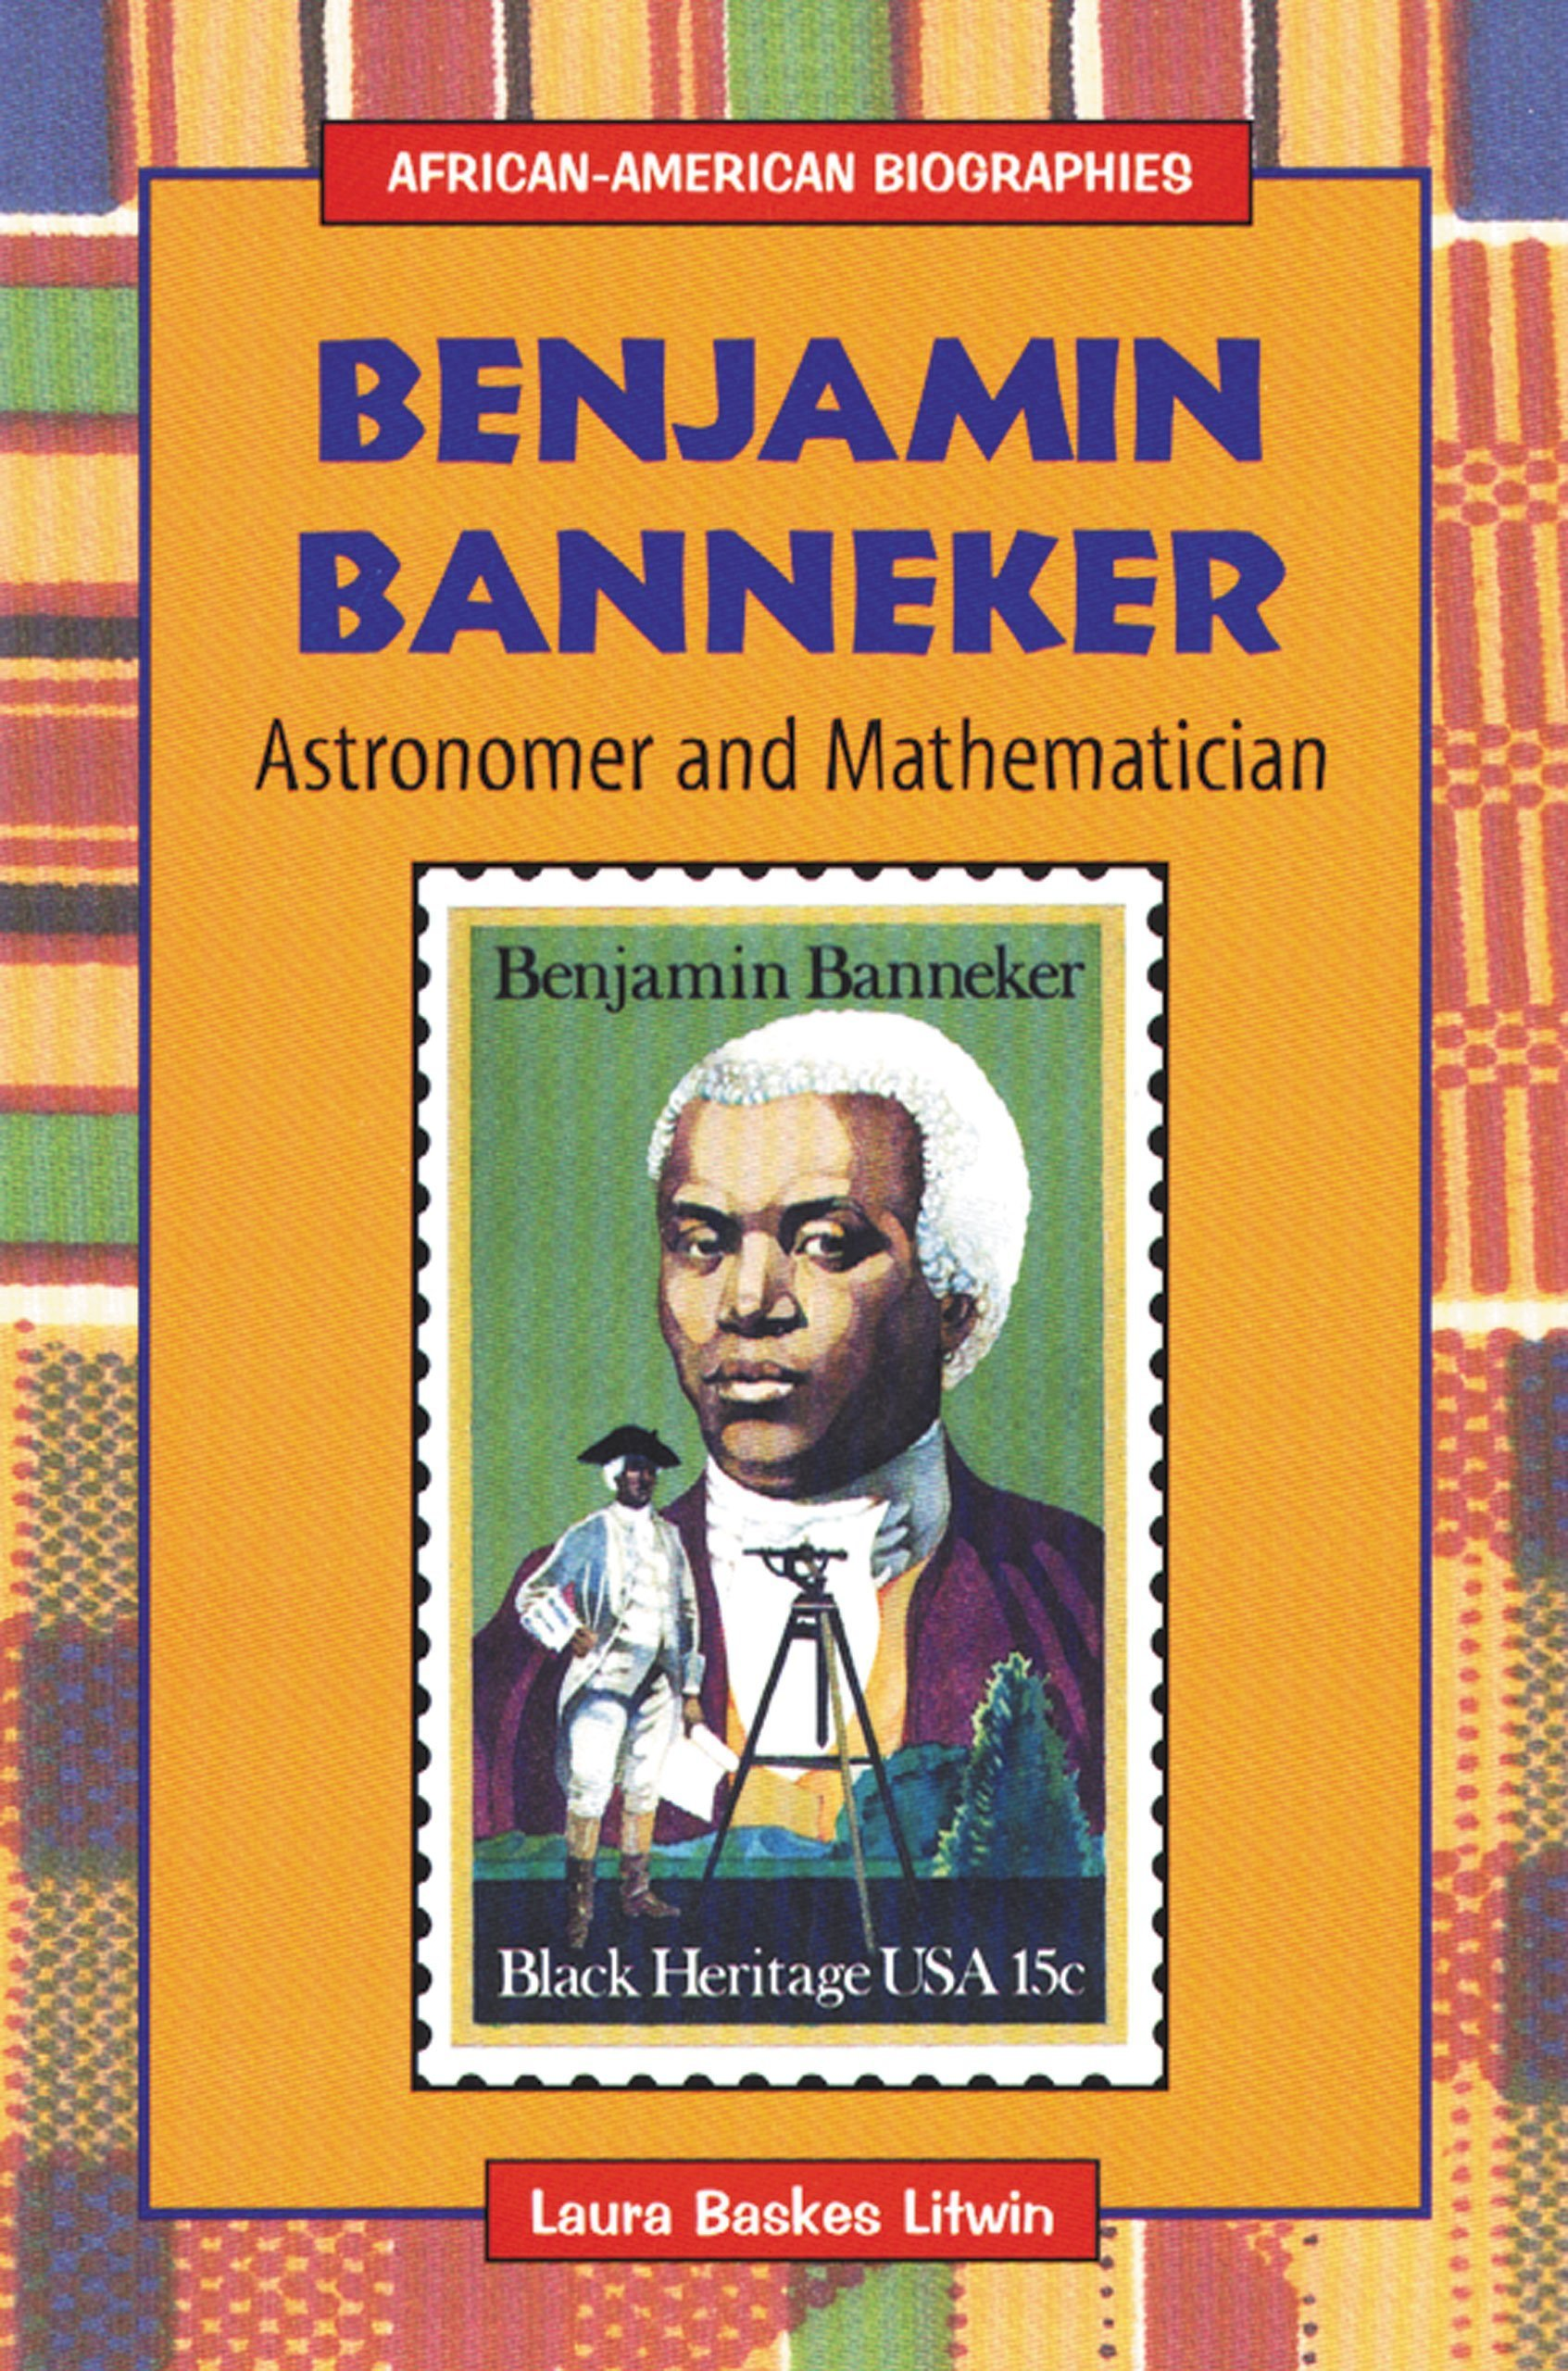 benjamin banneker astronomer and mathematician african american